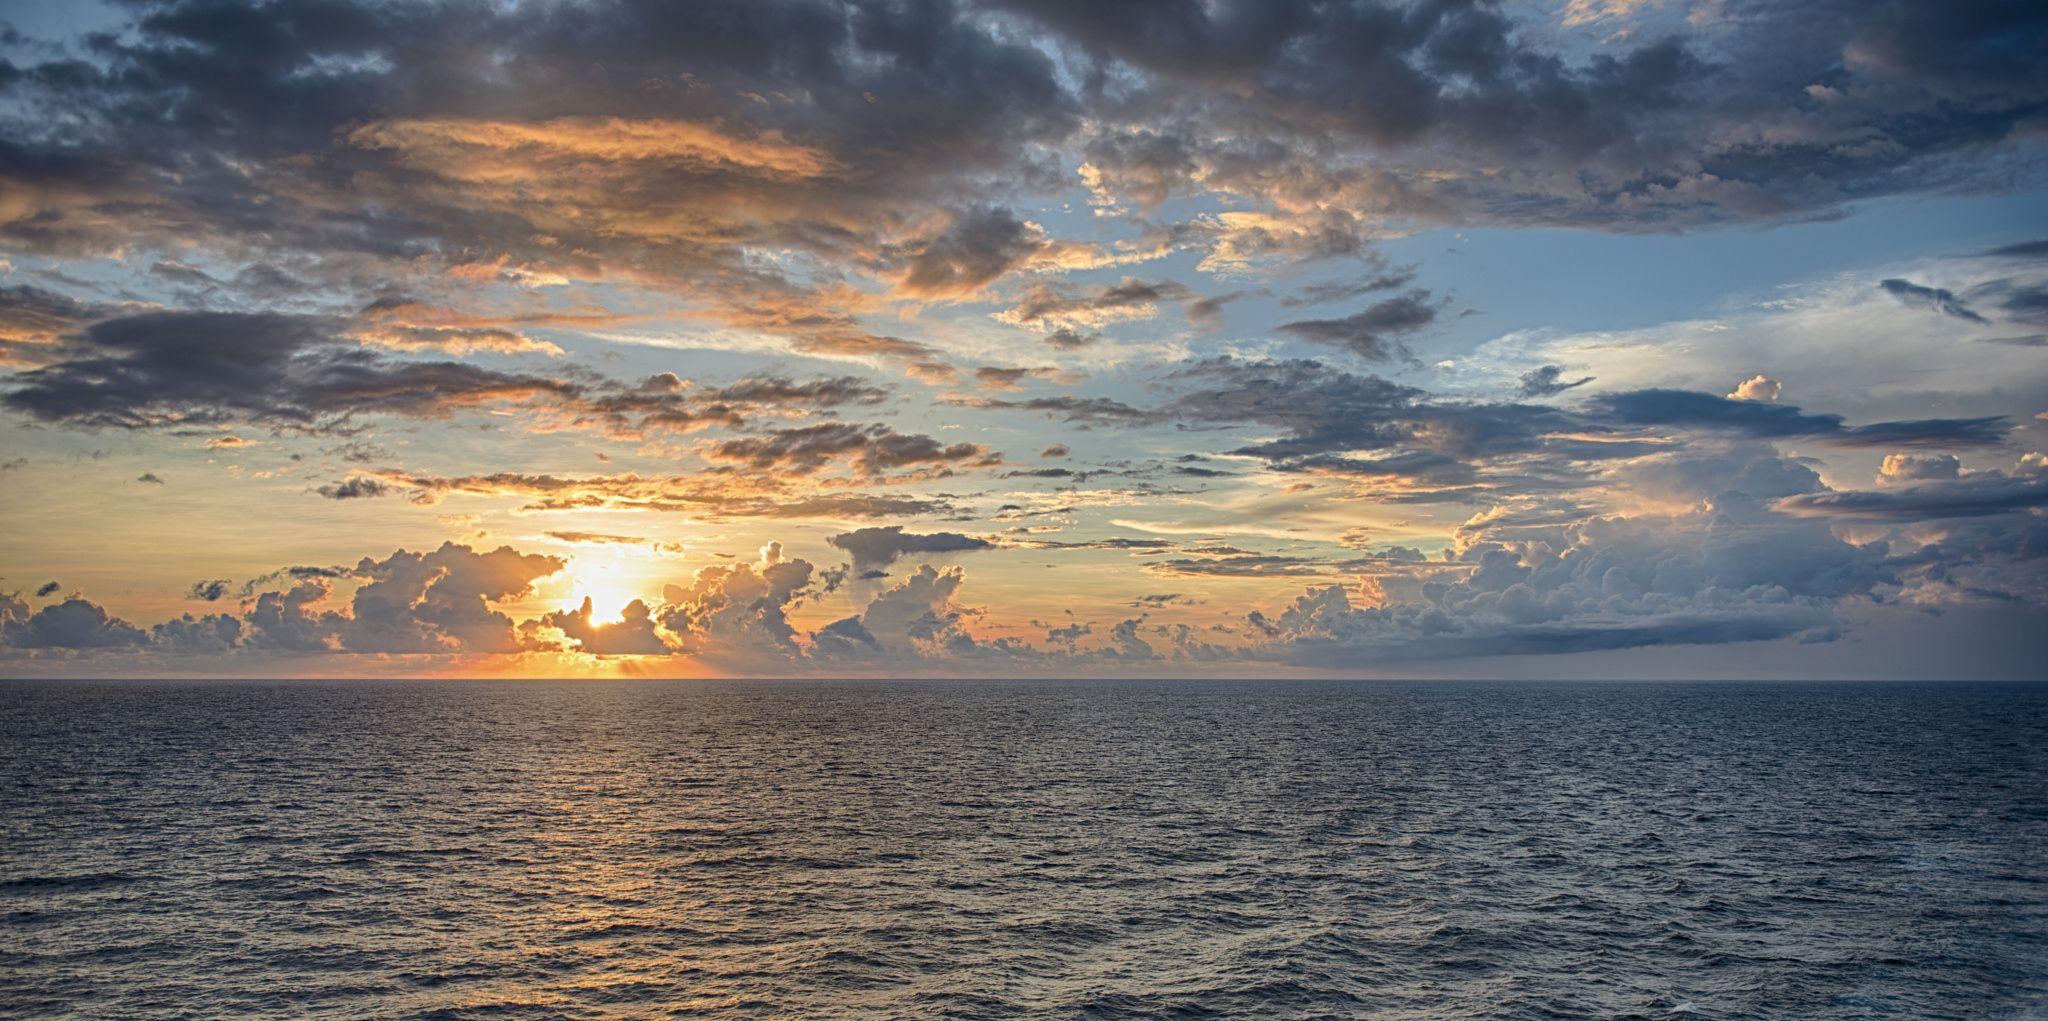 Western Caribbean Sunrise - null